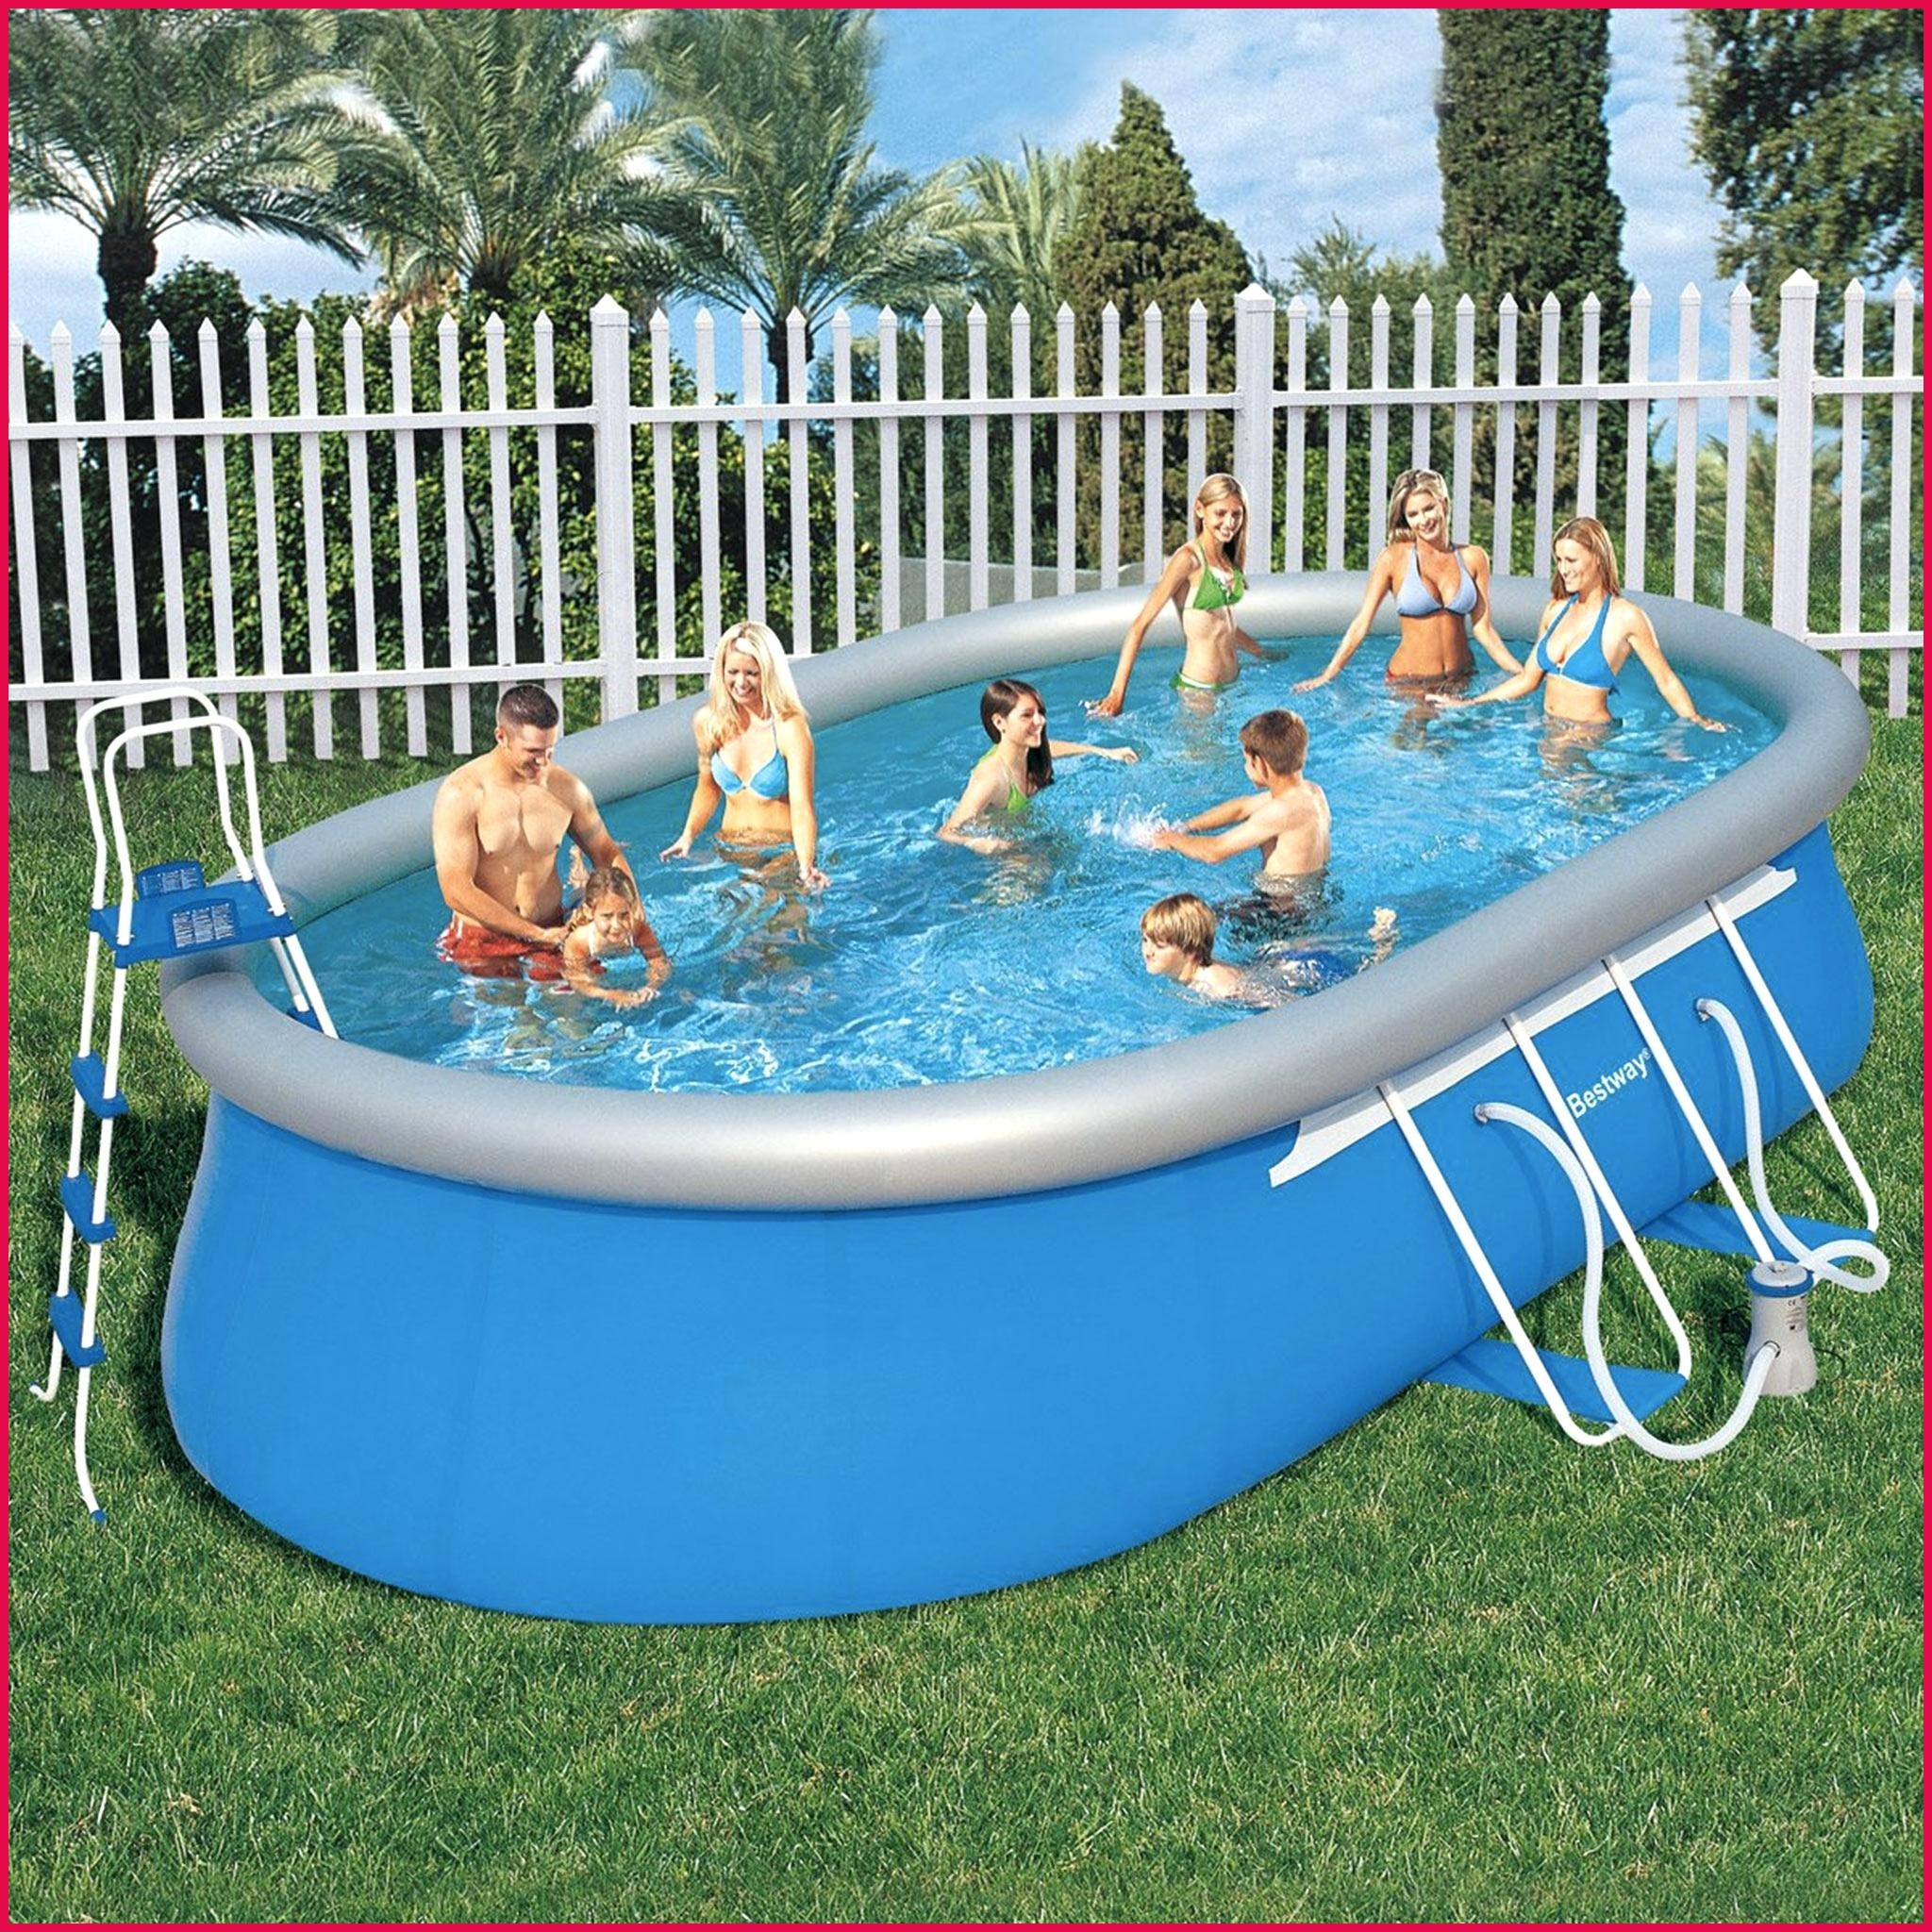 Bache piscine e leclerc - Piscine autoportee intex leclerc ...